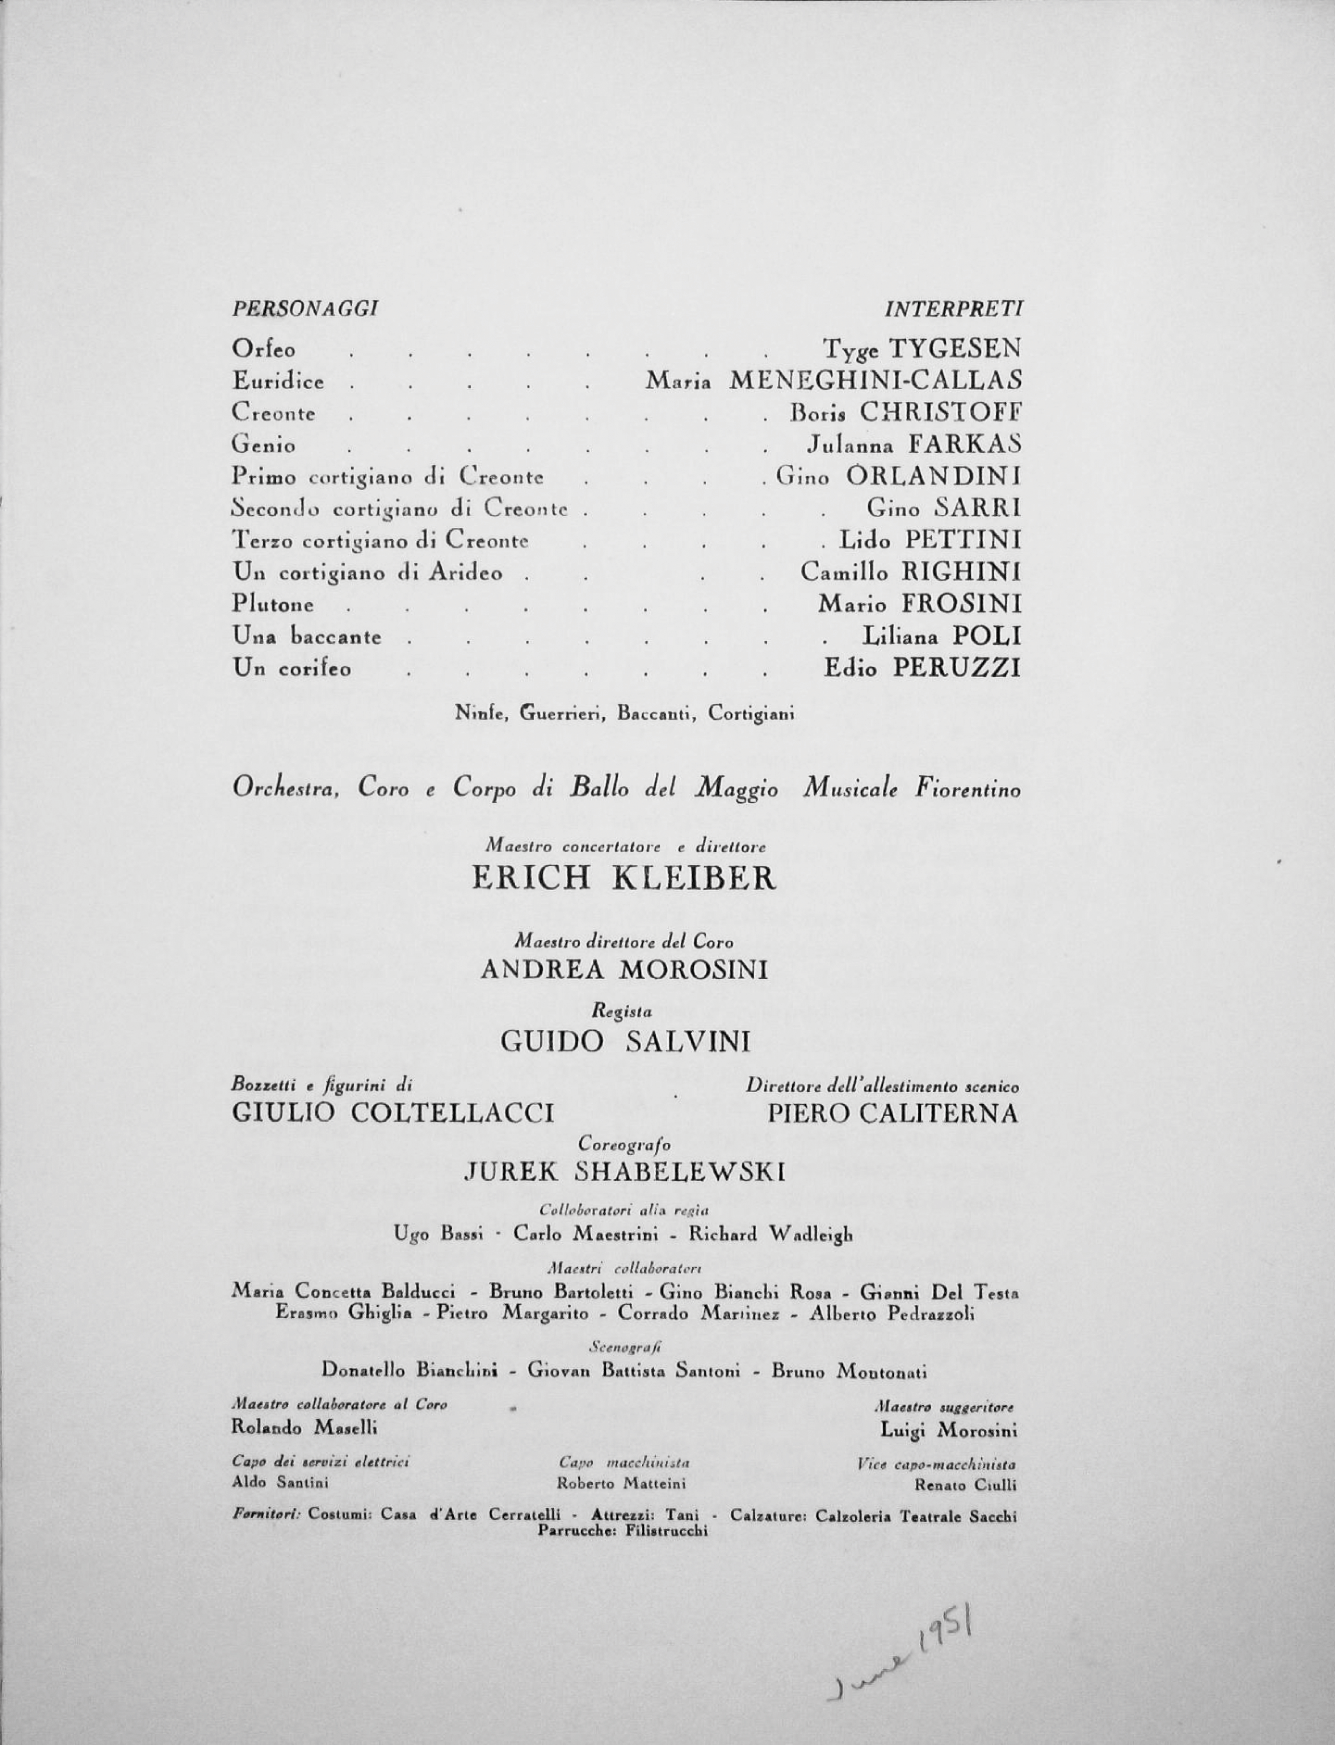 T - The Cambridge Haydn Encyclopedia